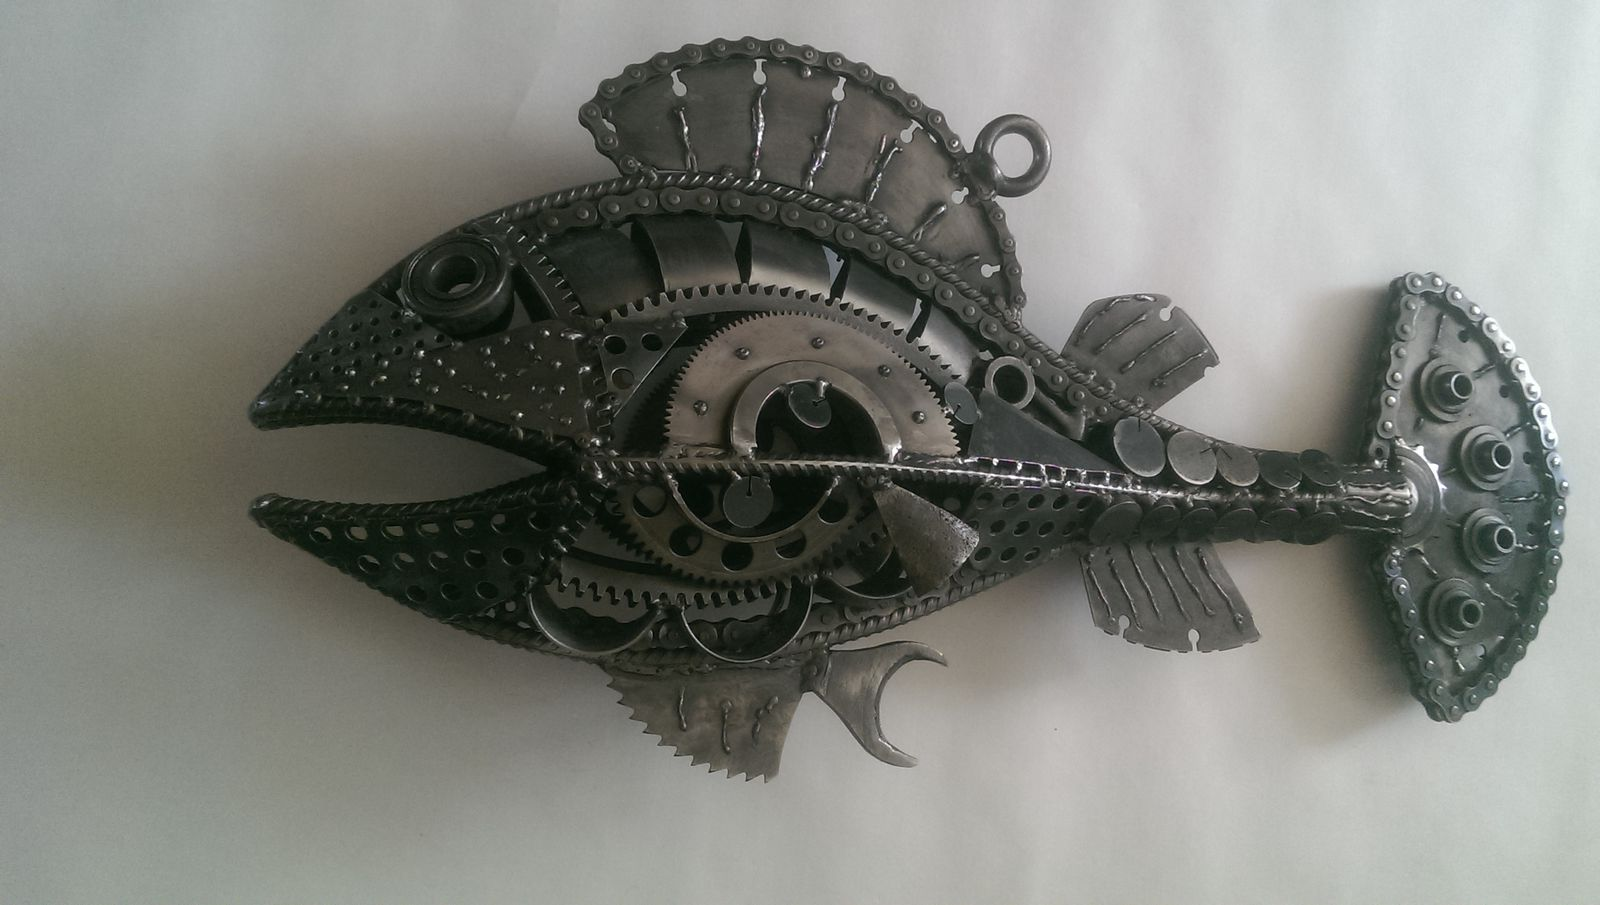 Рыба.Подвесная композиция